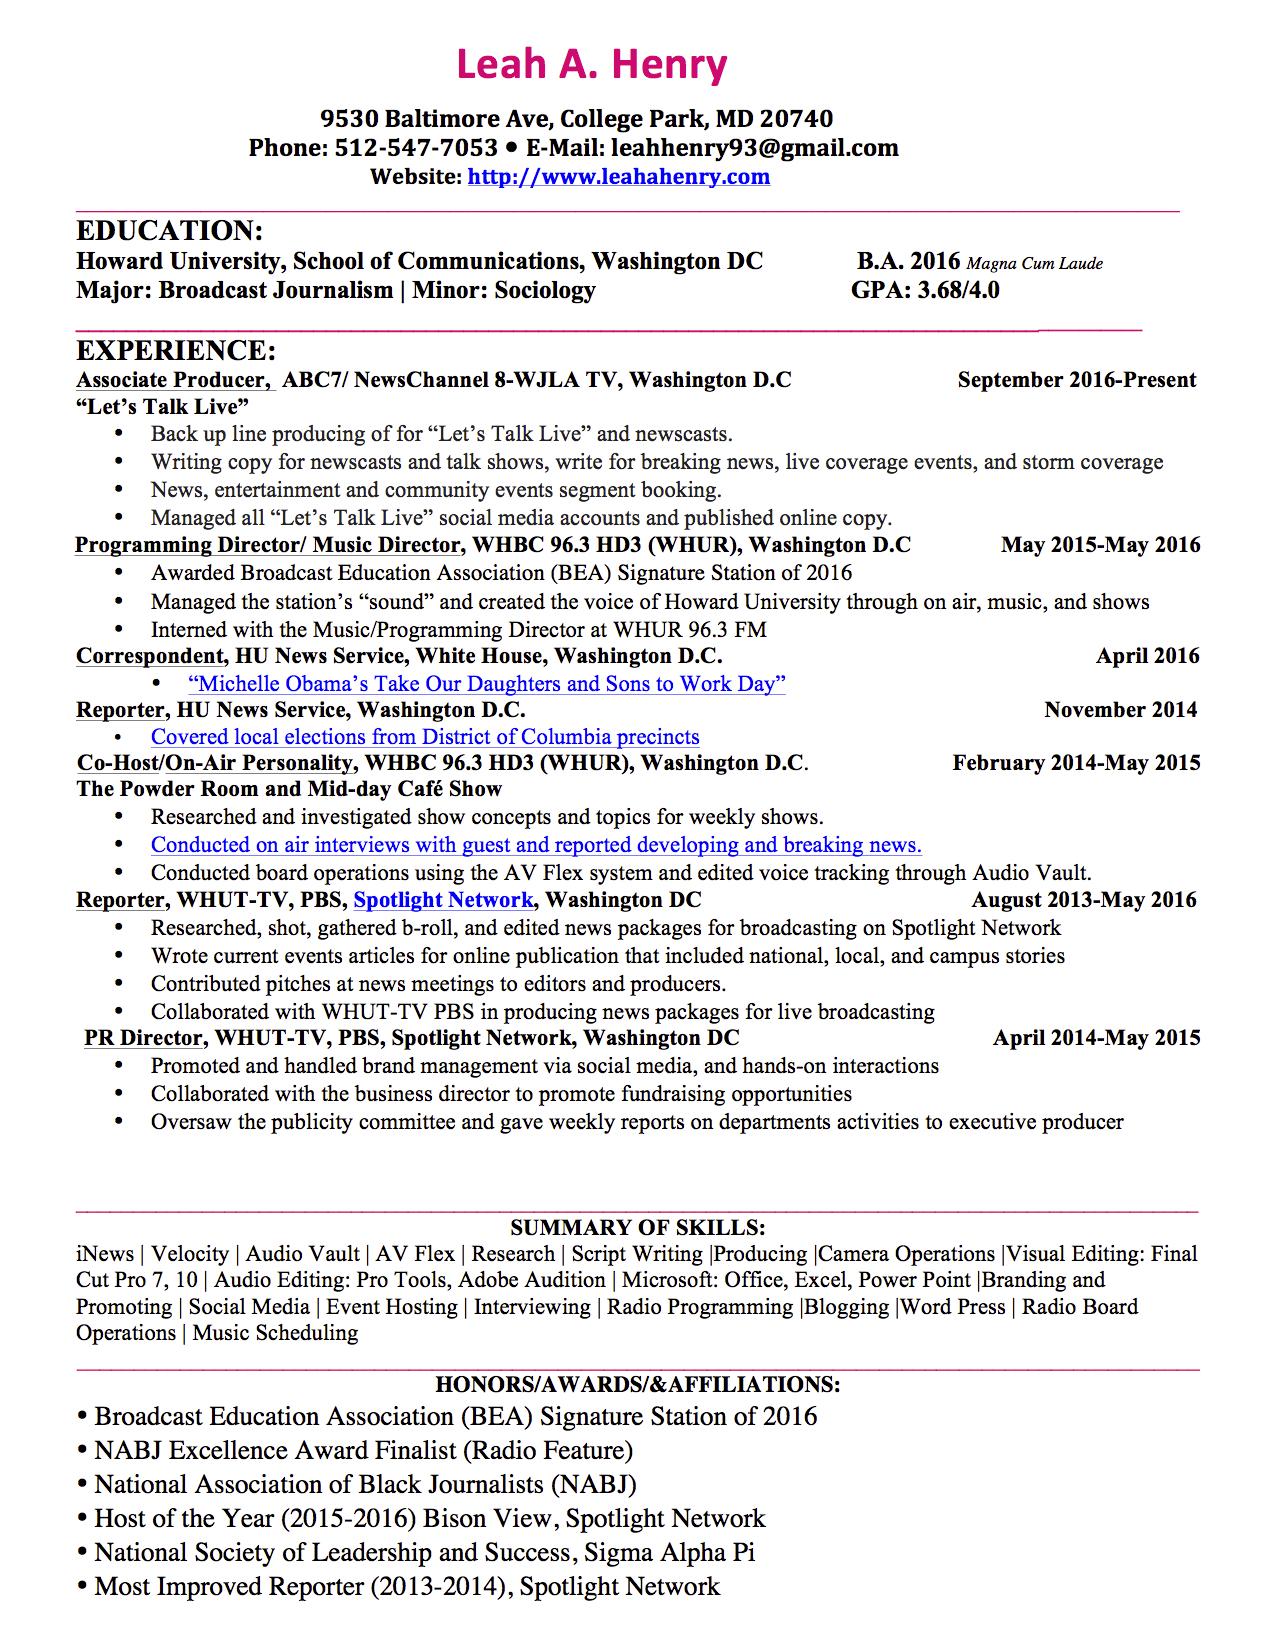 100 hostess duties resume examples of resumes resume hostess duties resume - Air Hostess Cover Letter